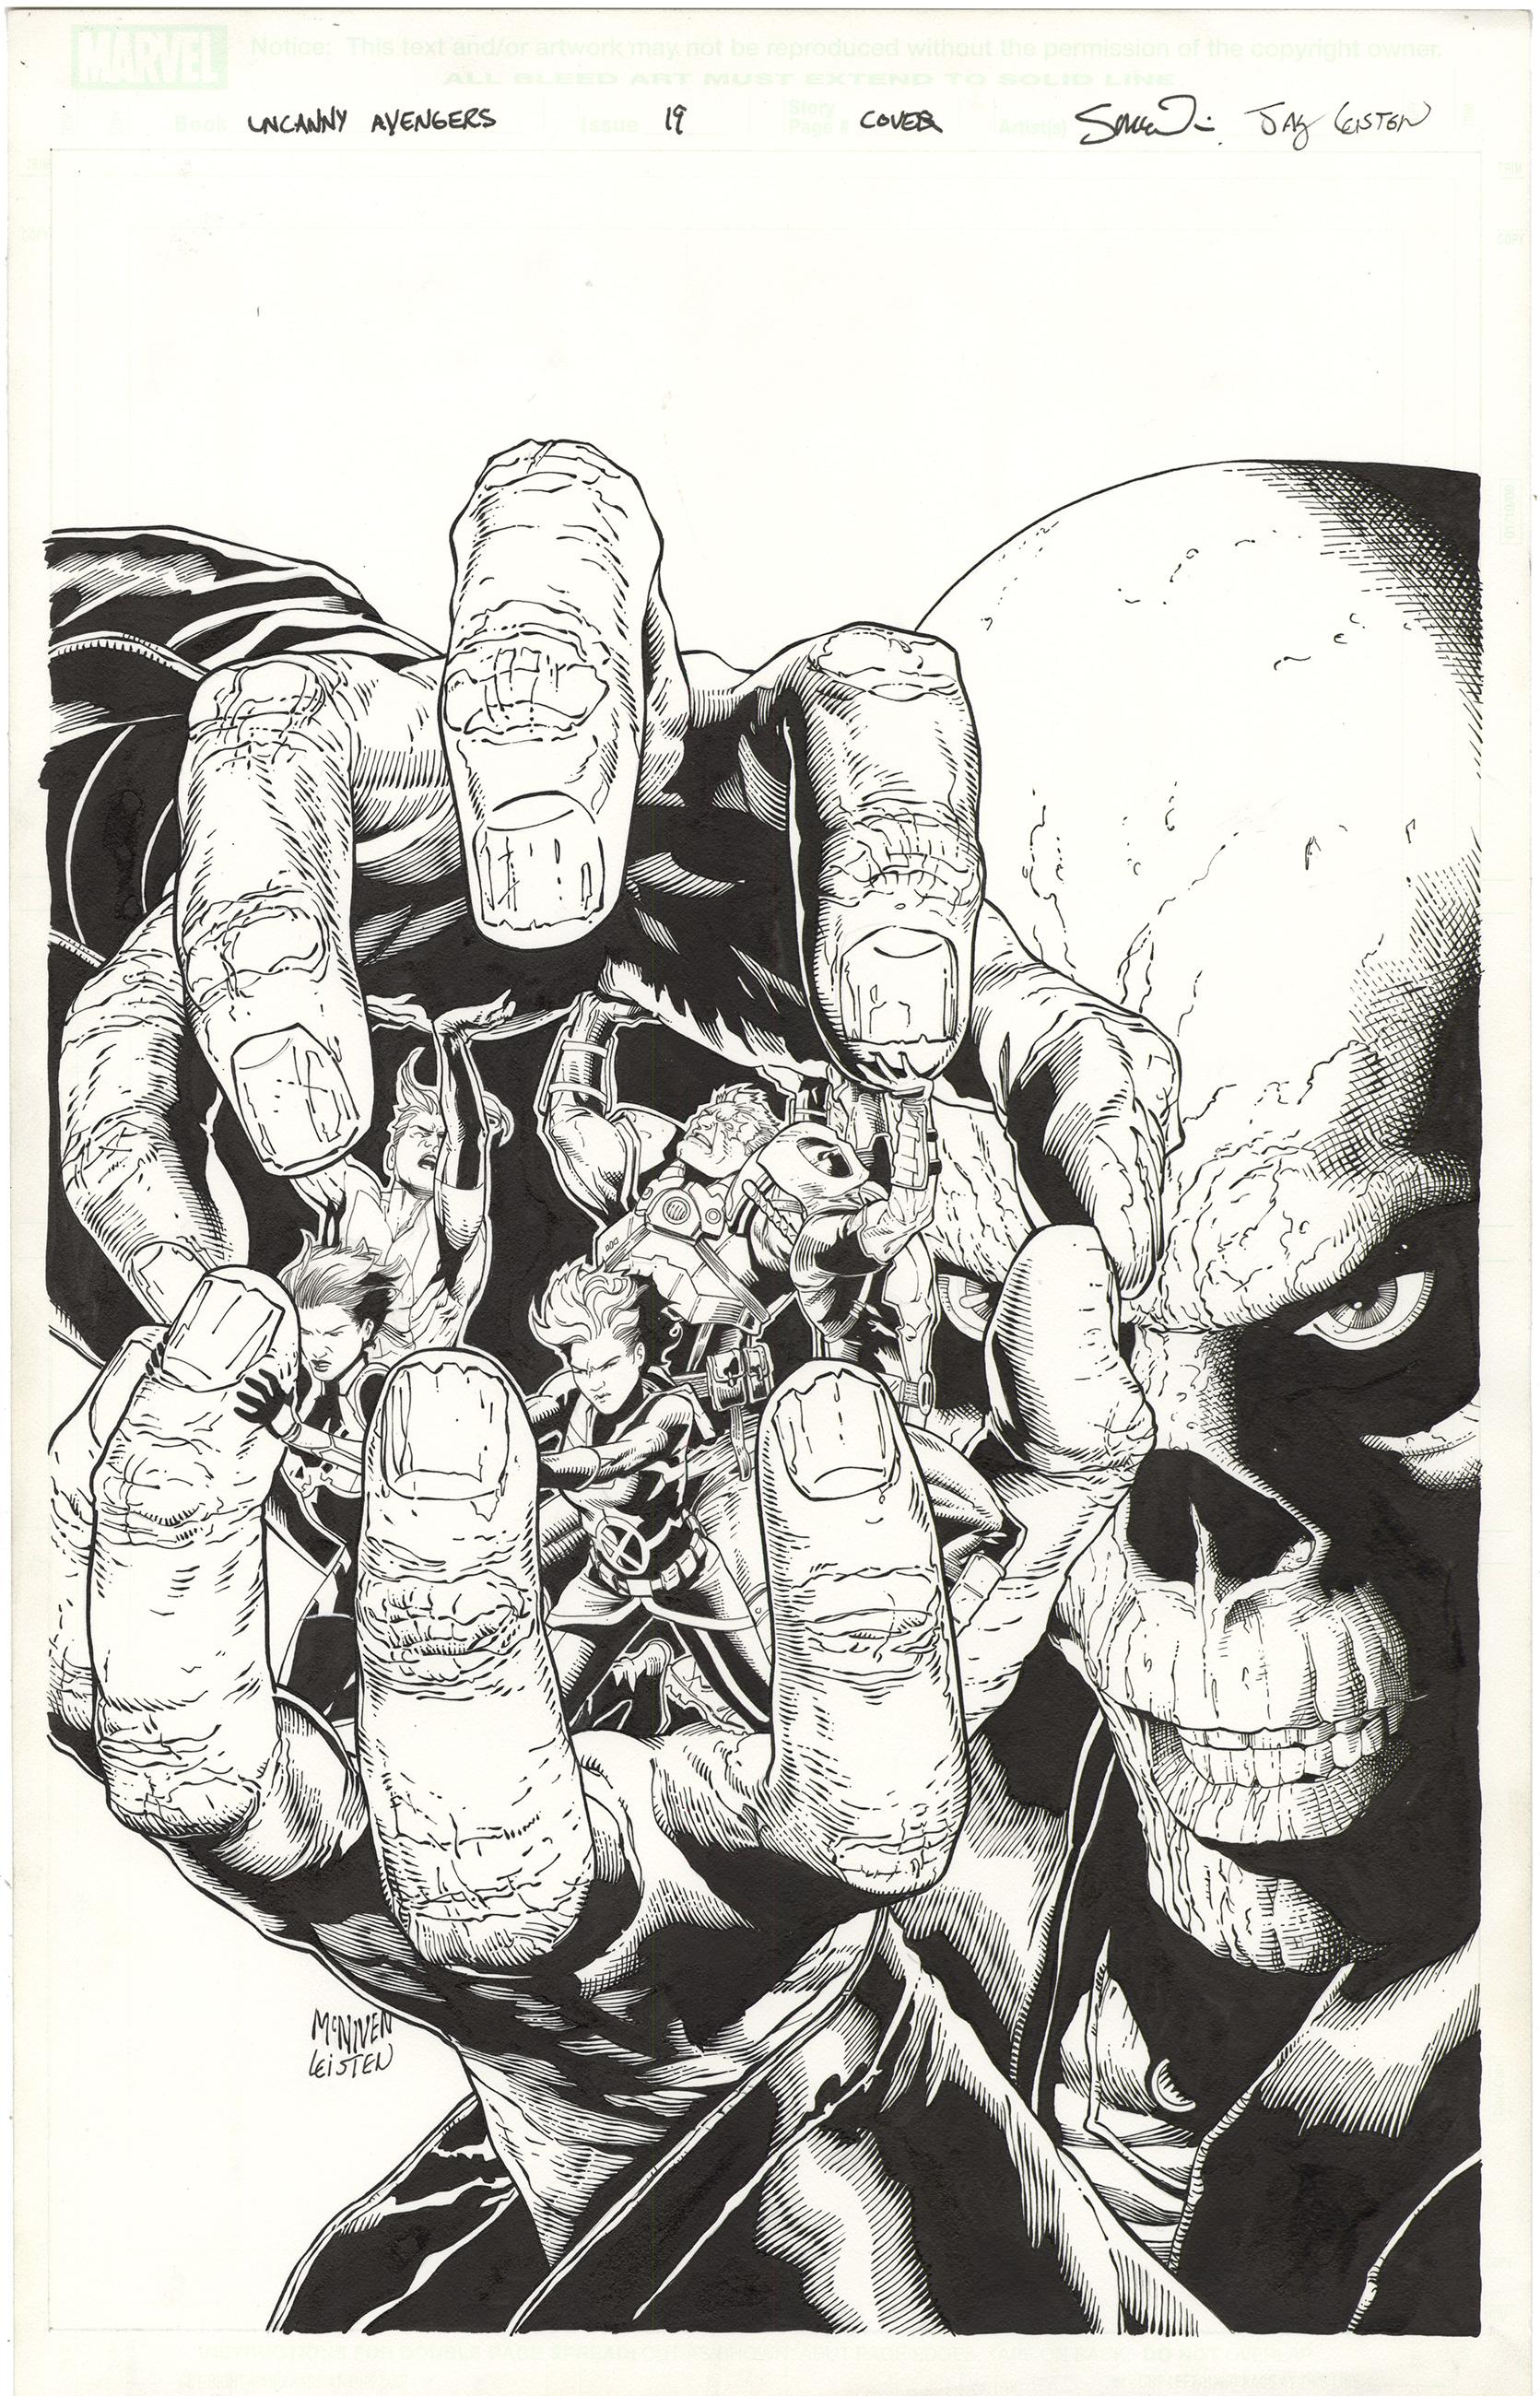 Uncanny Avengers #19 Cover